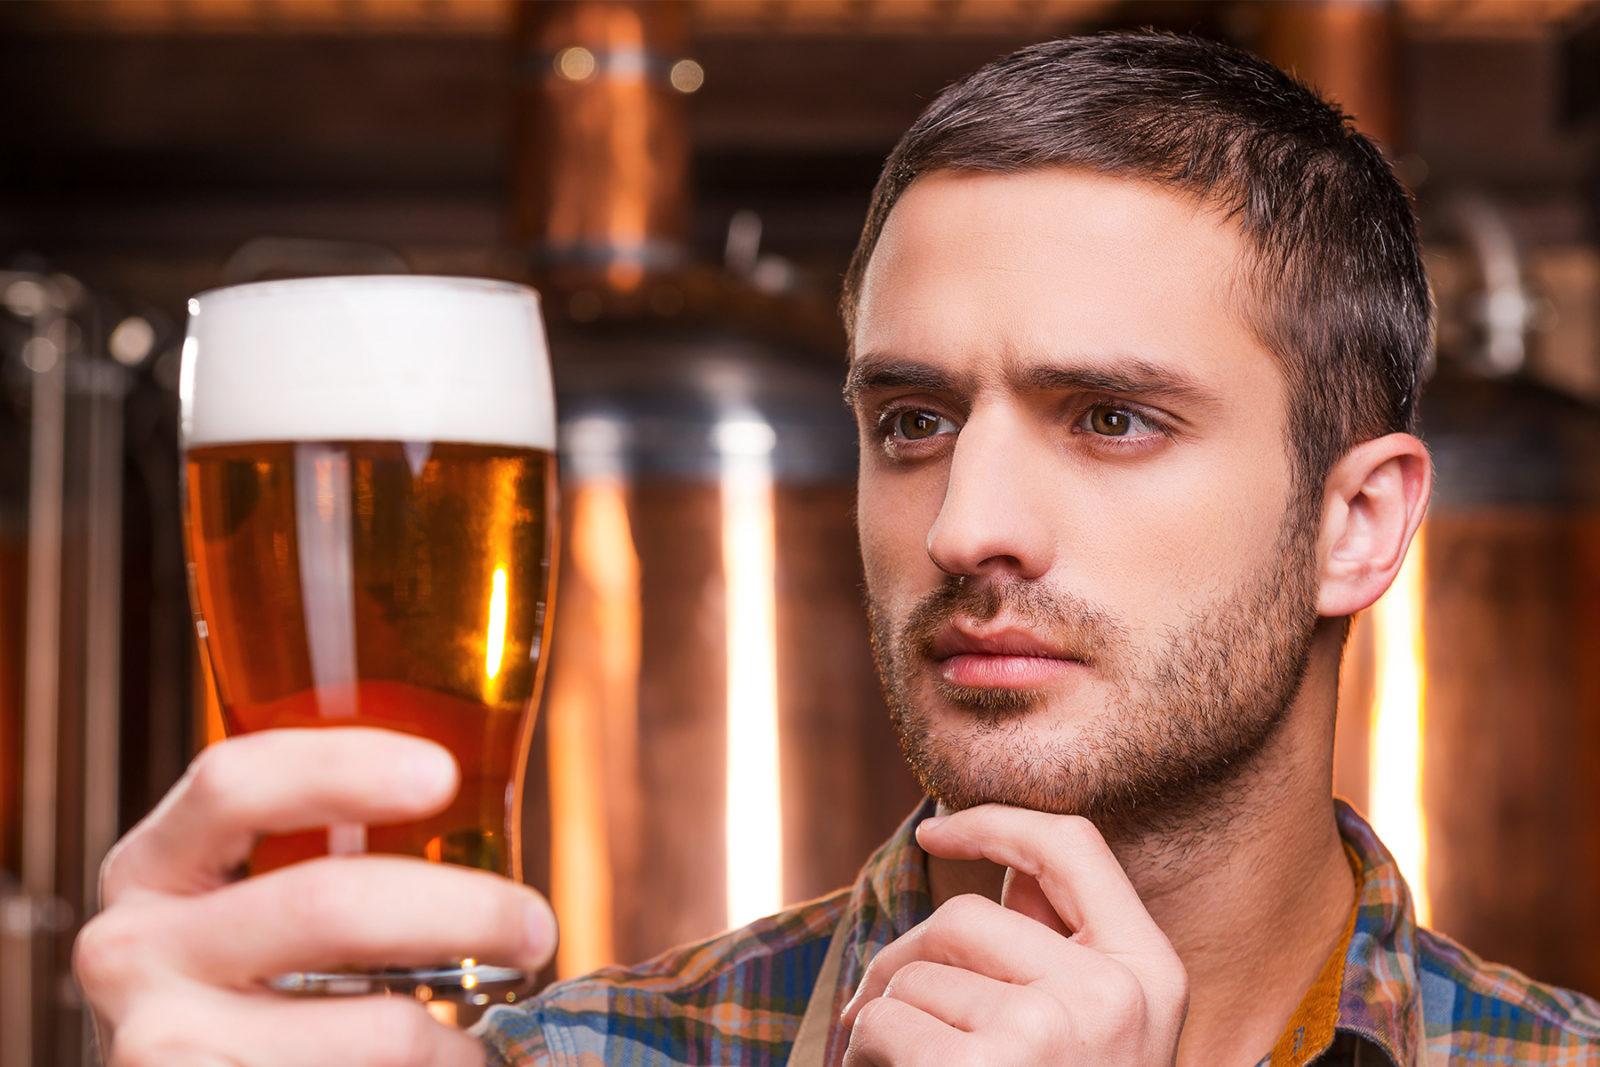 Drinking responsibly | MensLine Australia